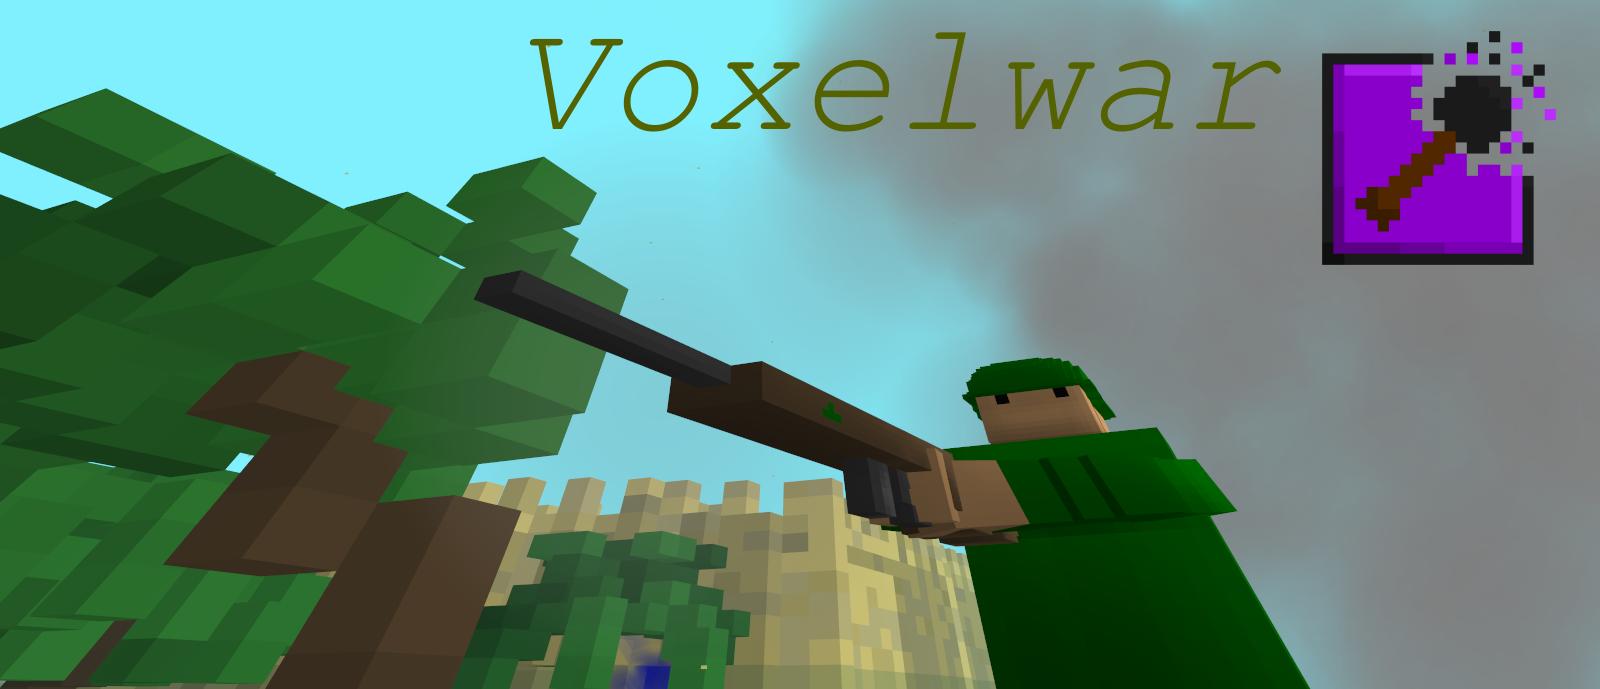 Voxelwar